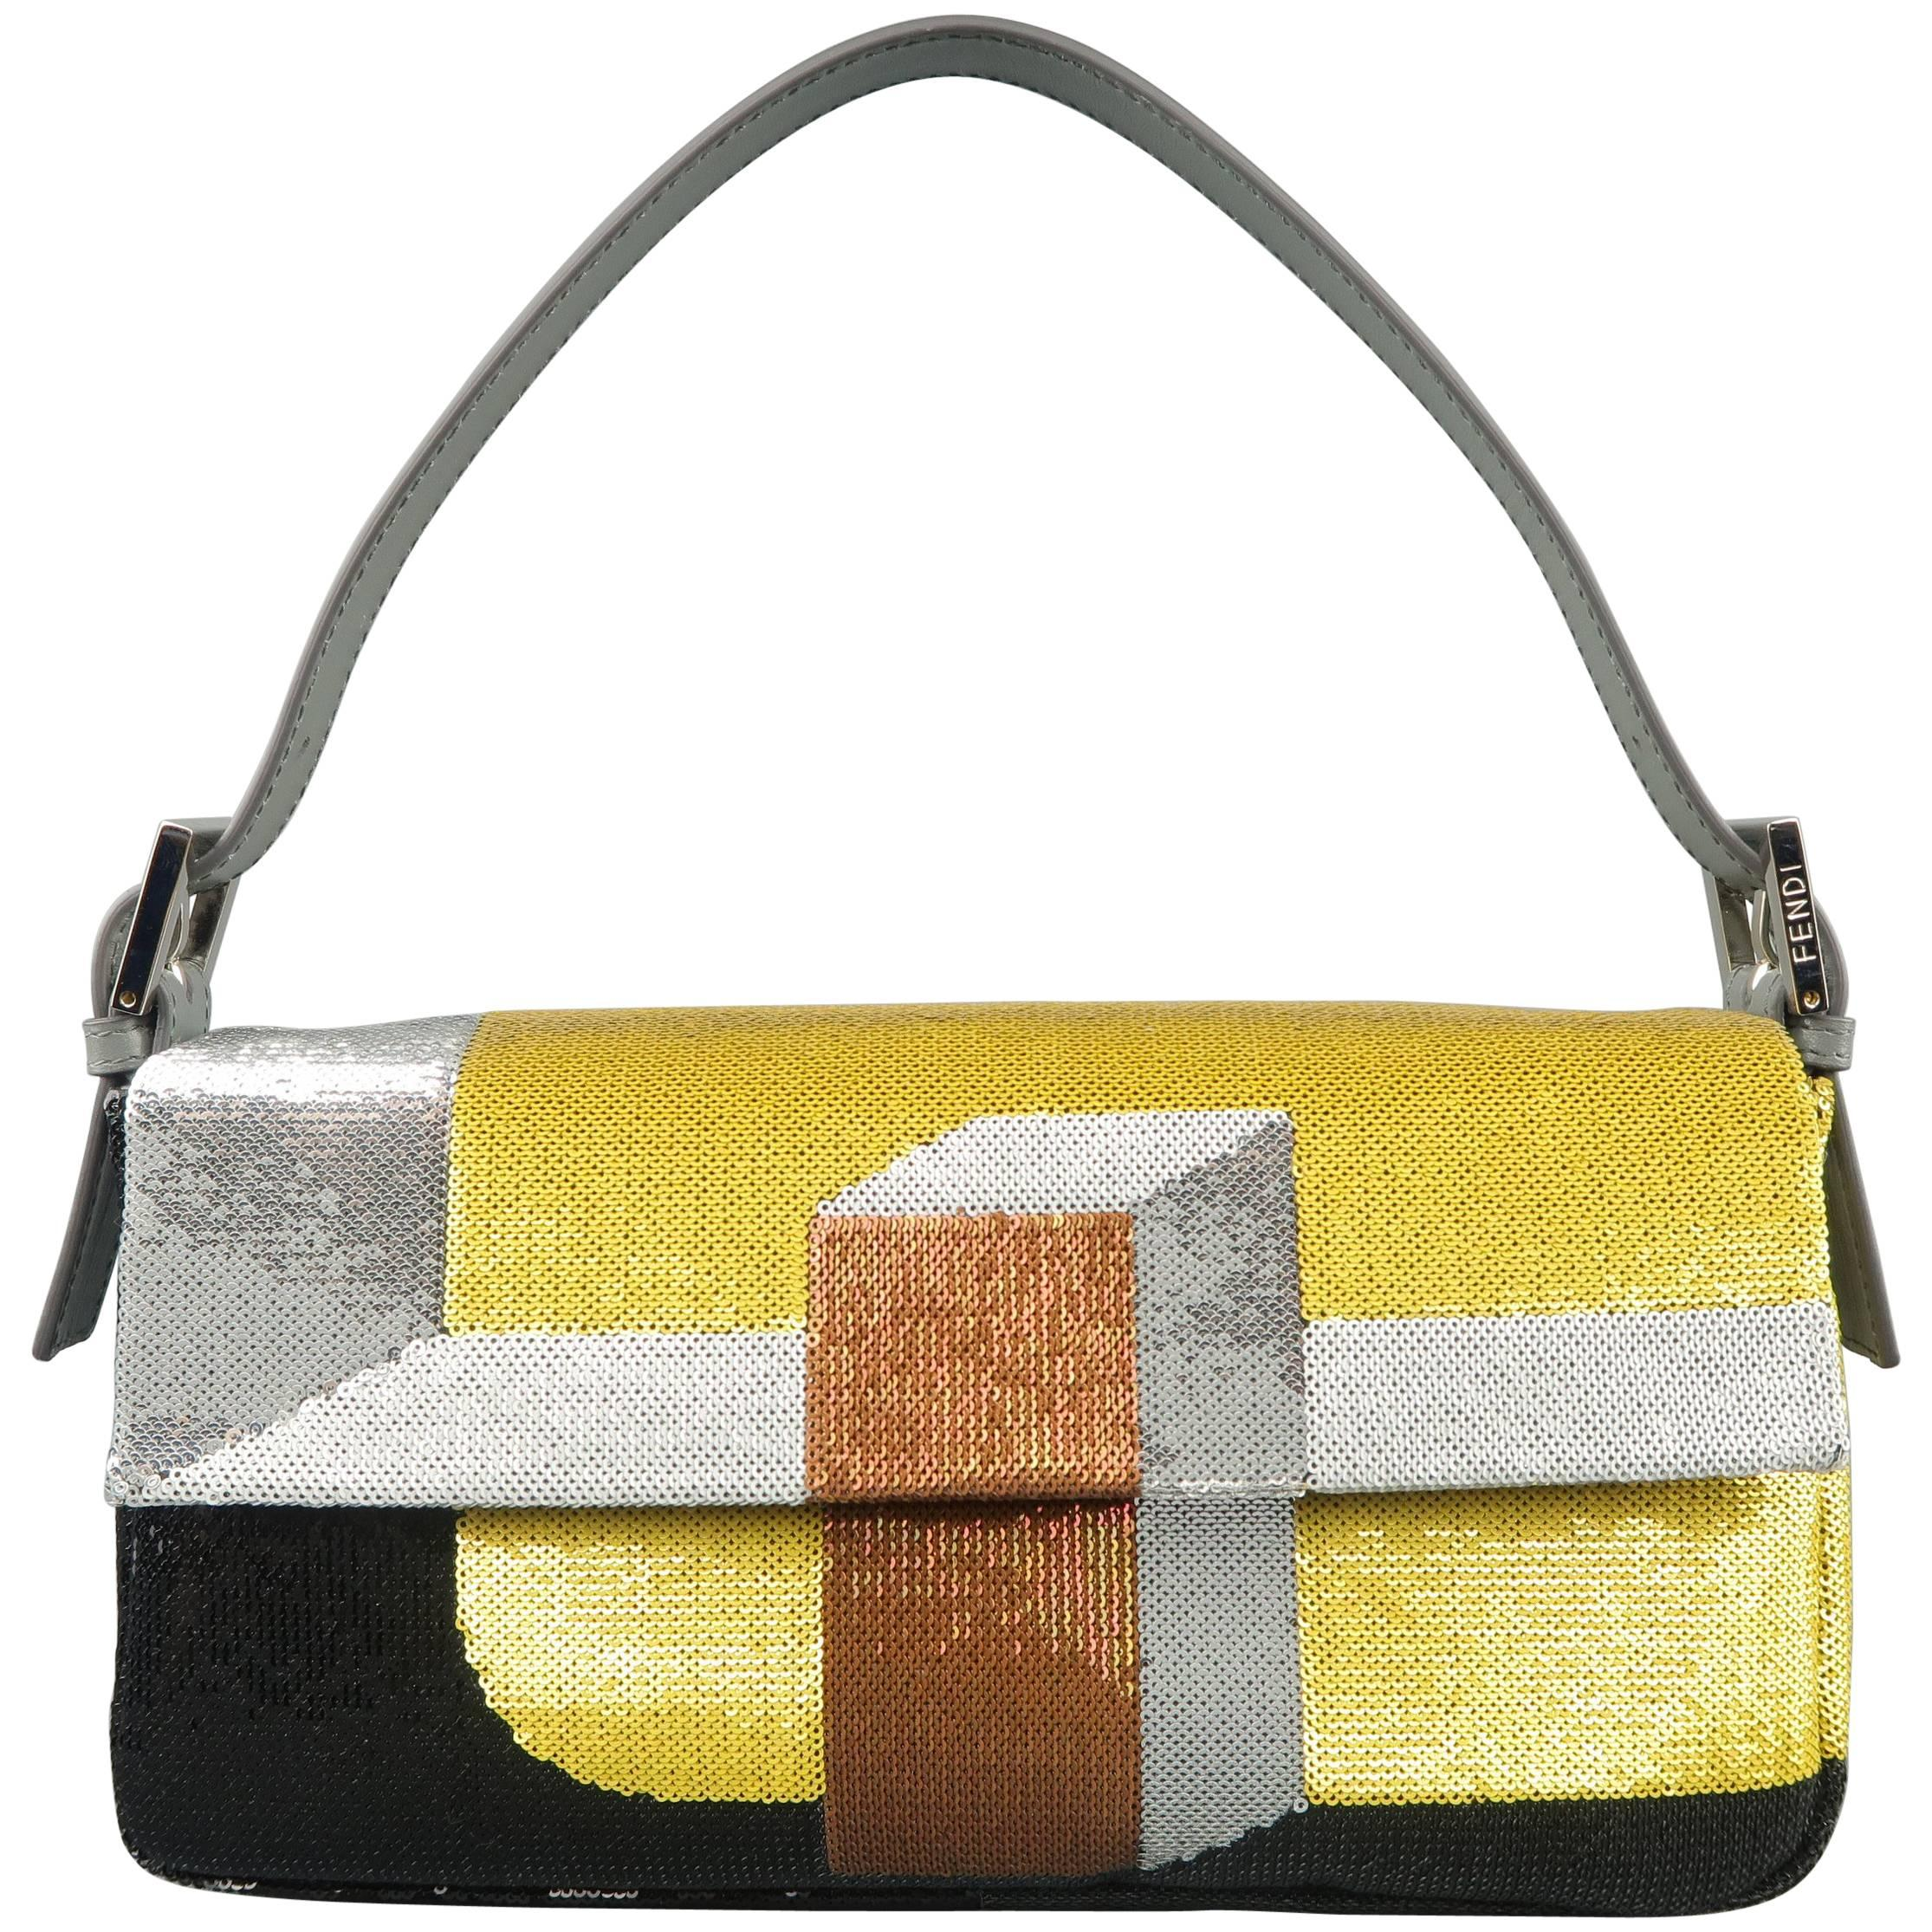 906a241c41 Fendi Gold Silver and Bronze Color Block Sequined Baguette Handbag at  1stdibs